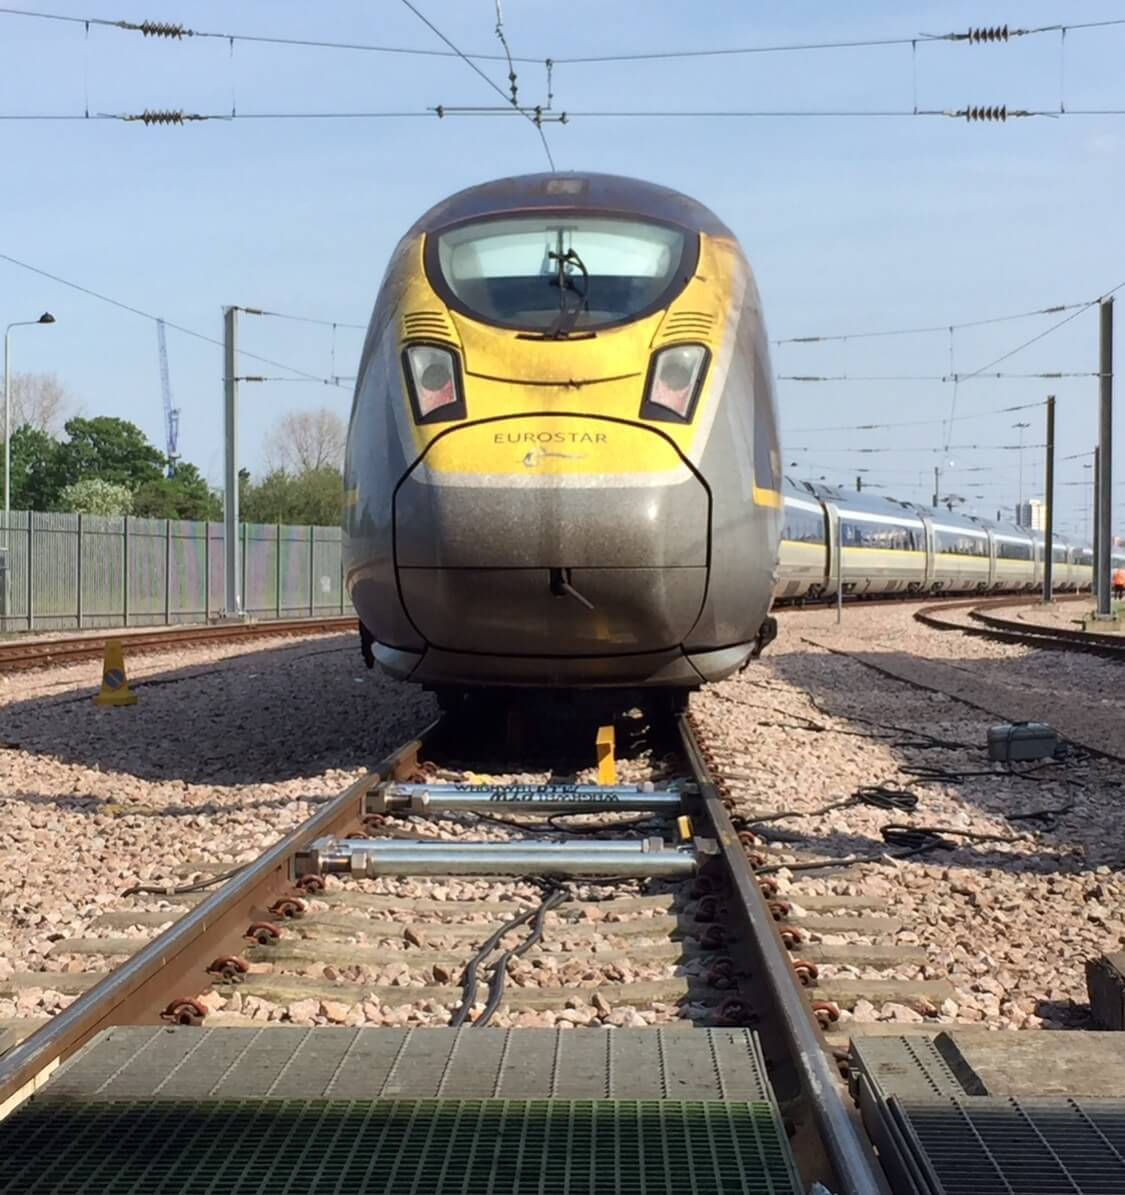 High speed train weighing